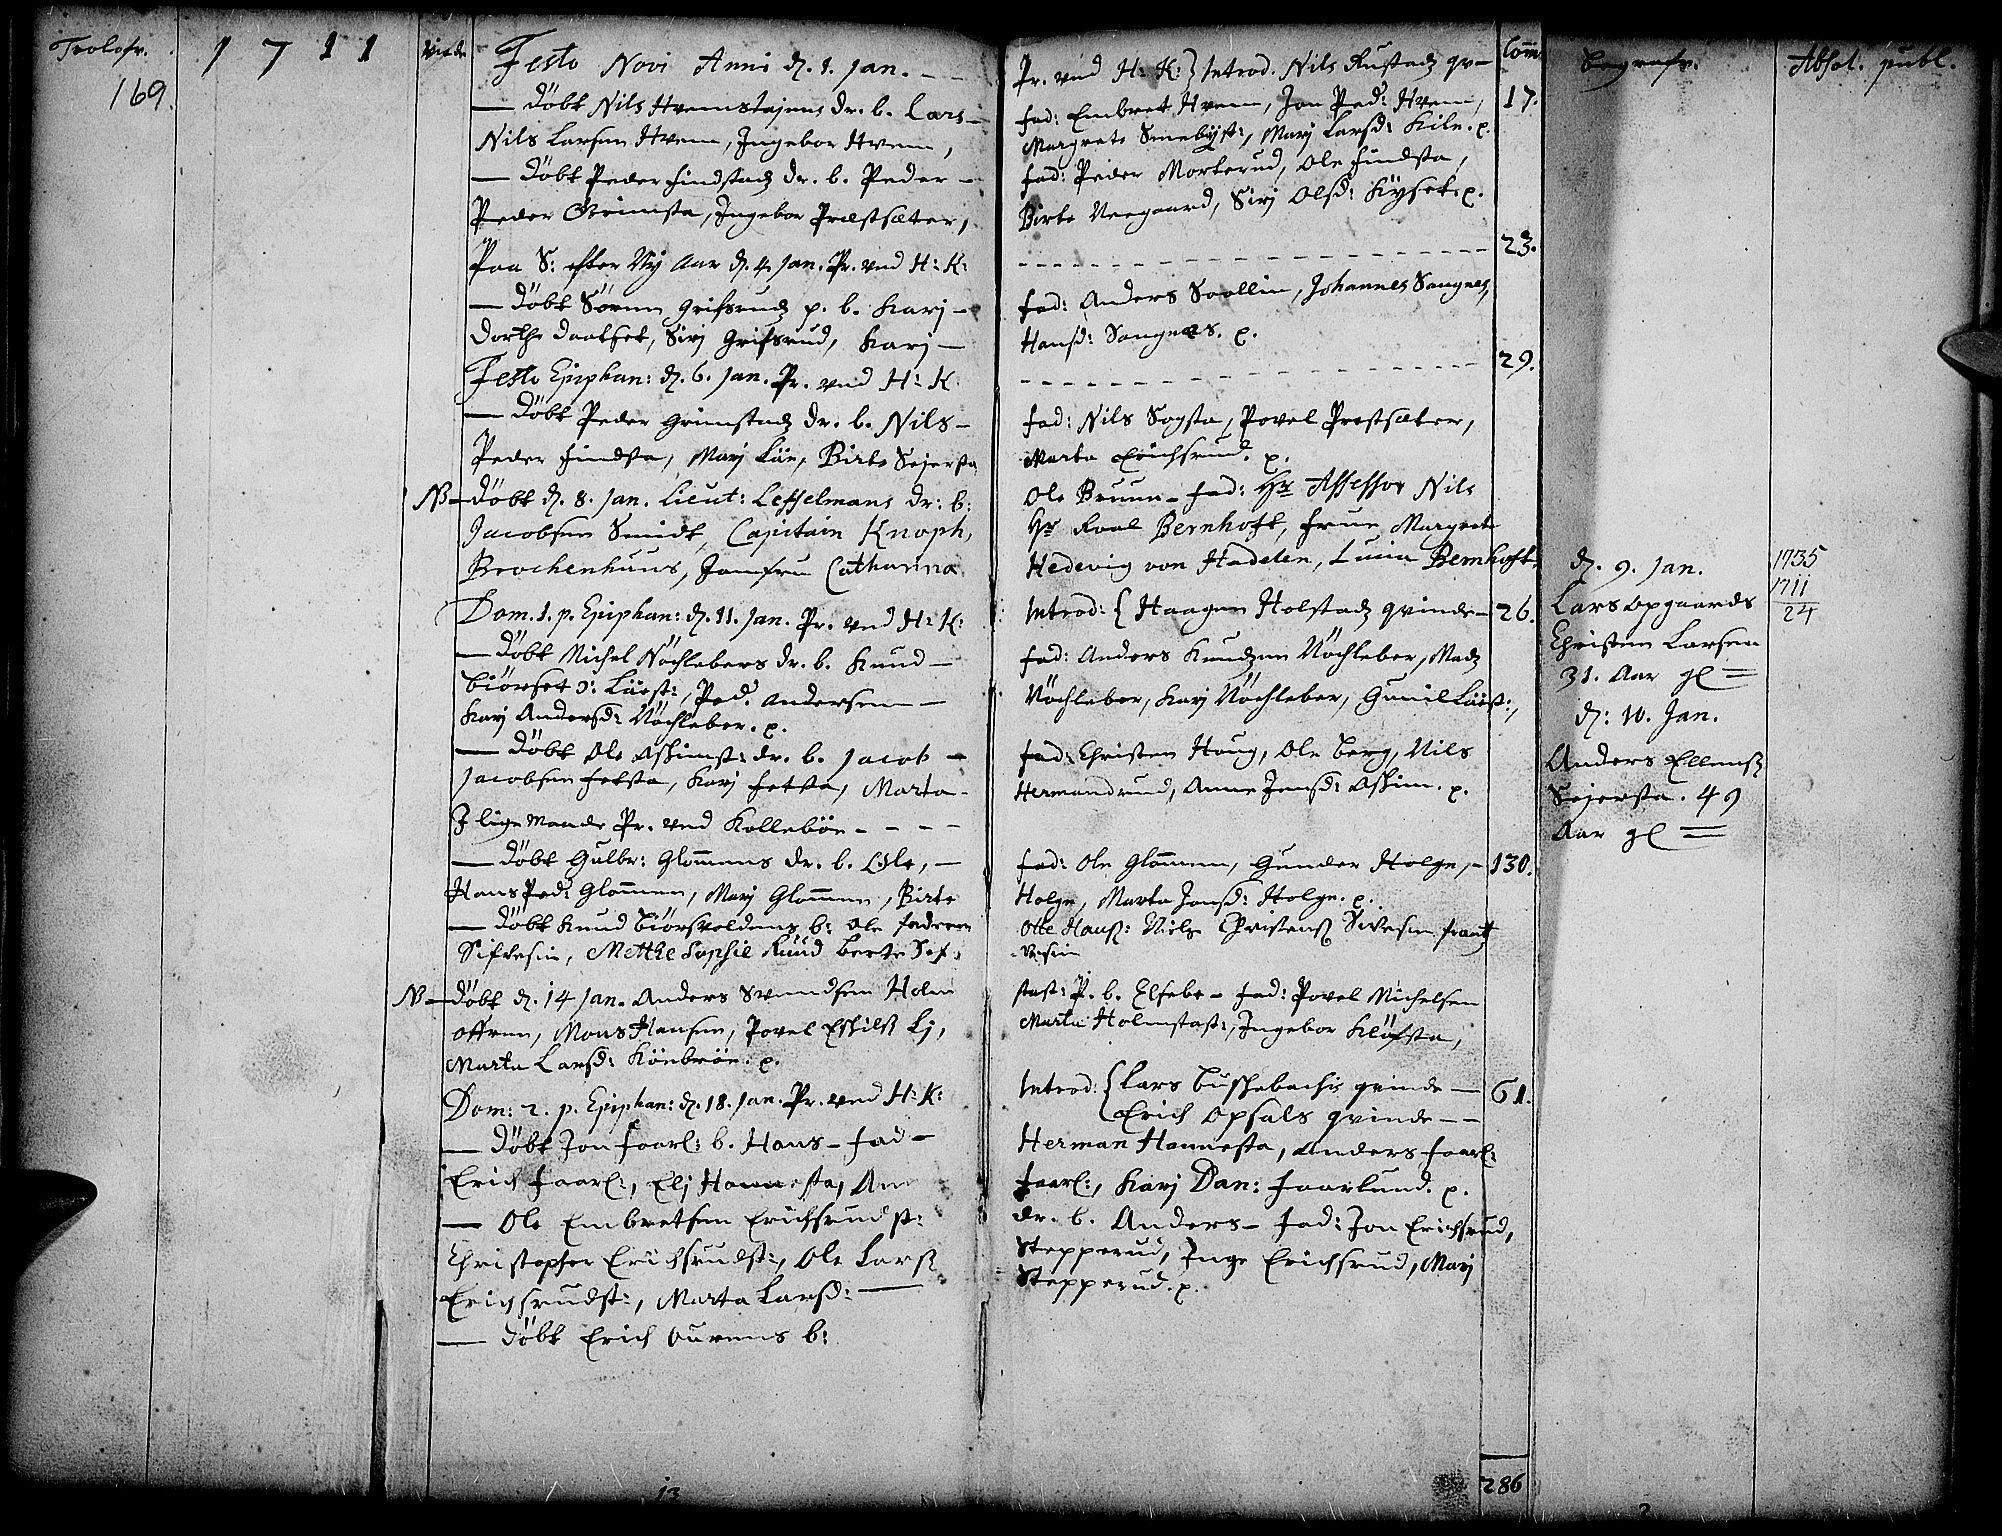 SAH, Toten prestekontor, Ministerialbok nr. 1, 1695-1713, s. 169